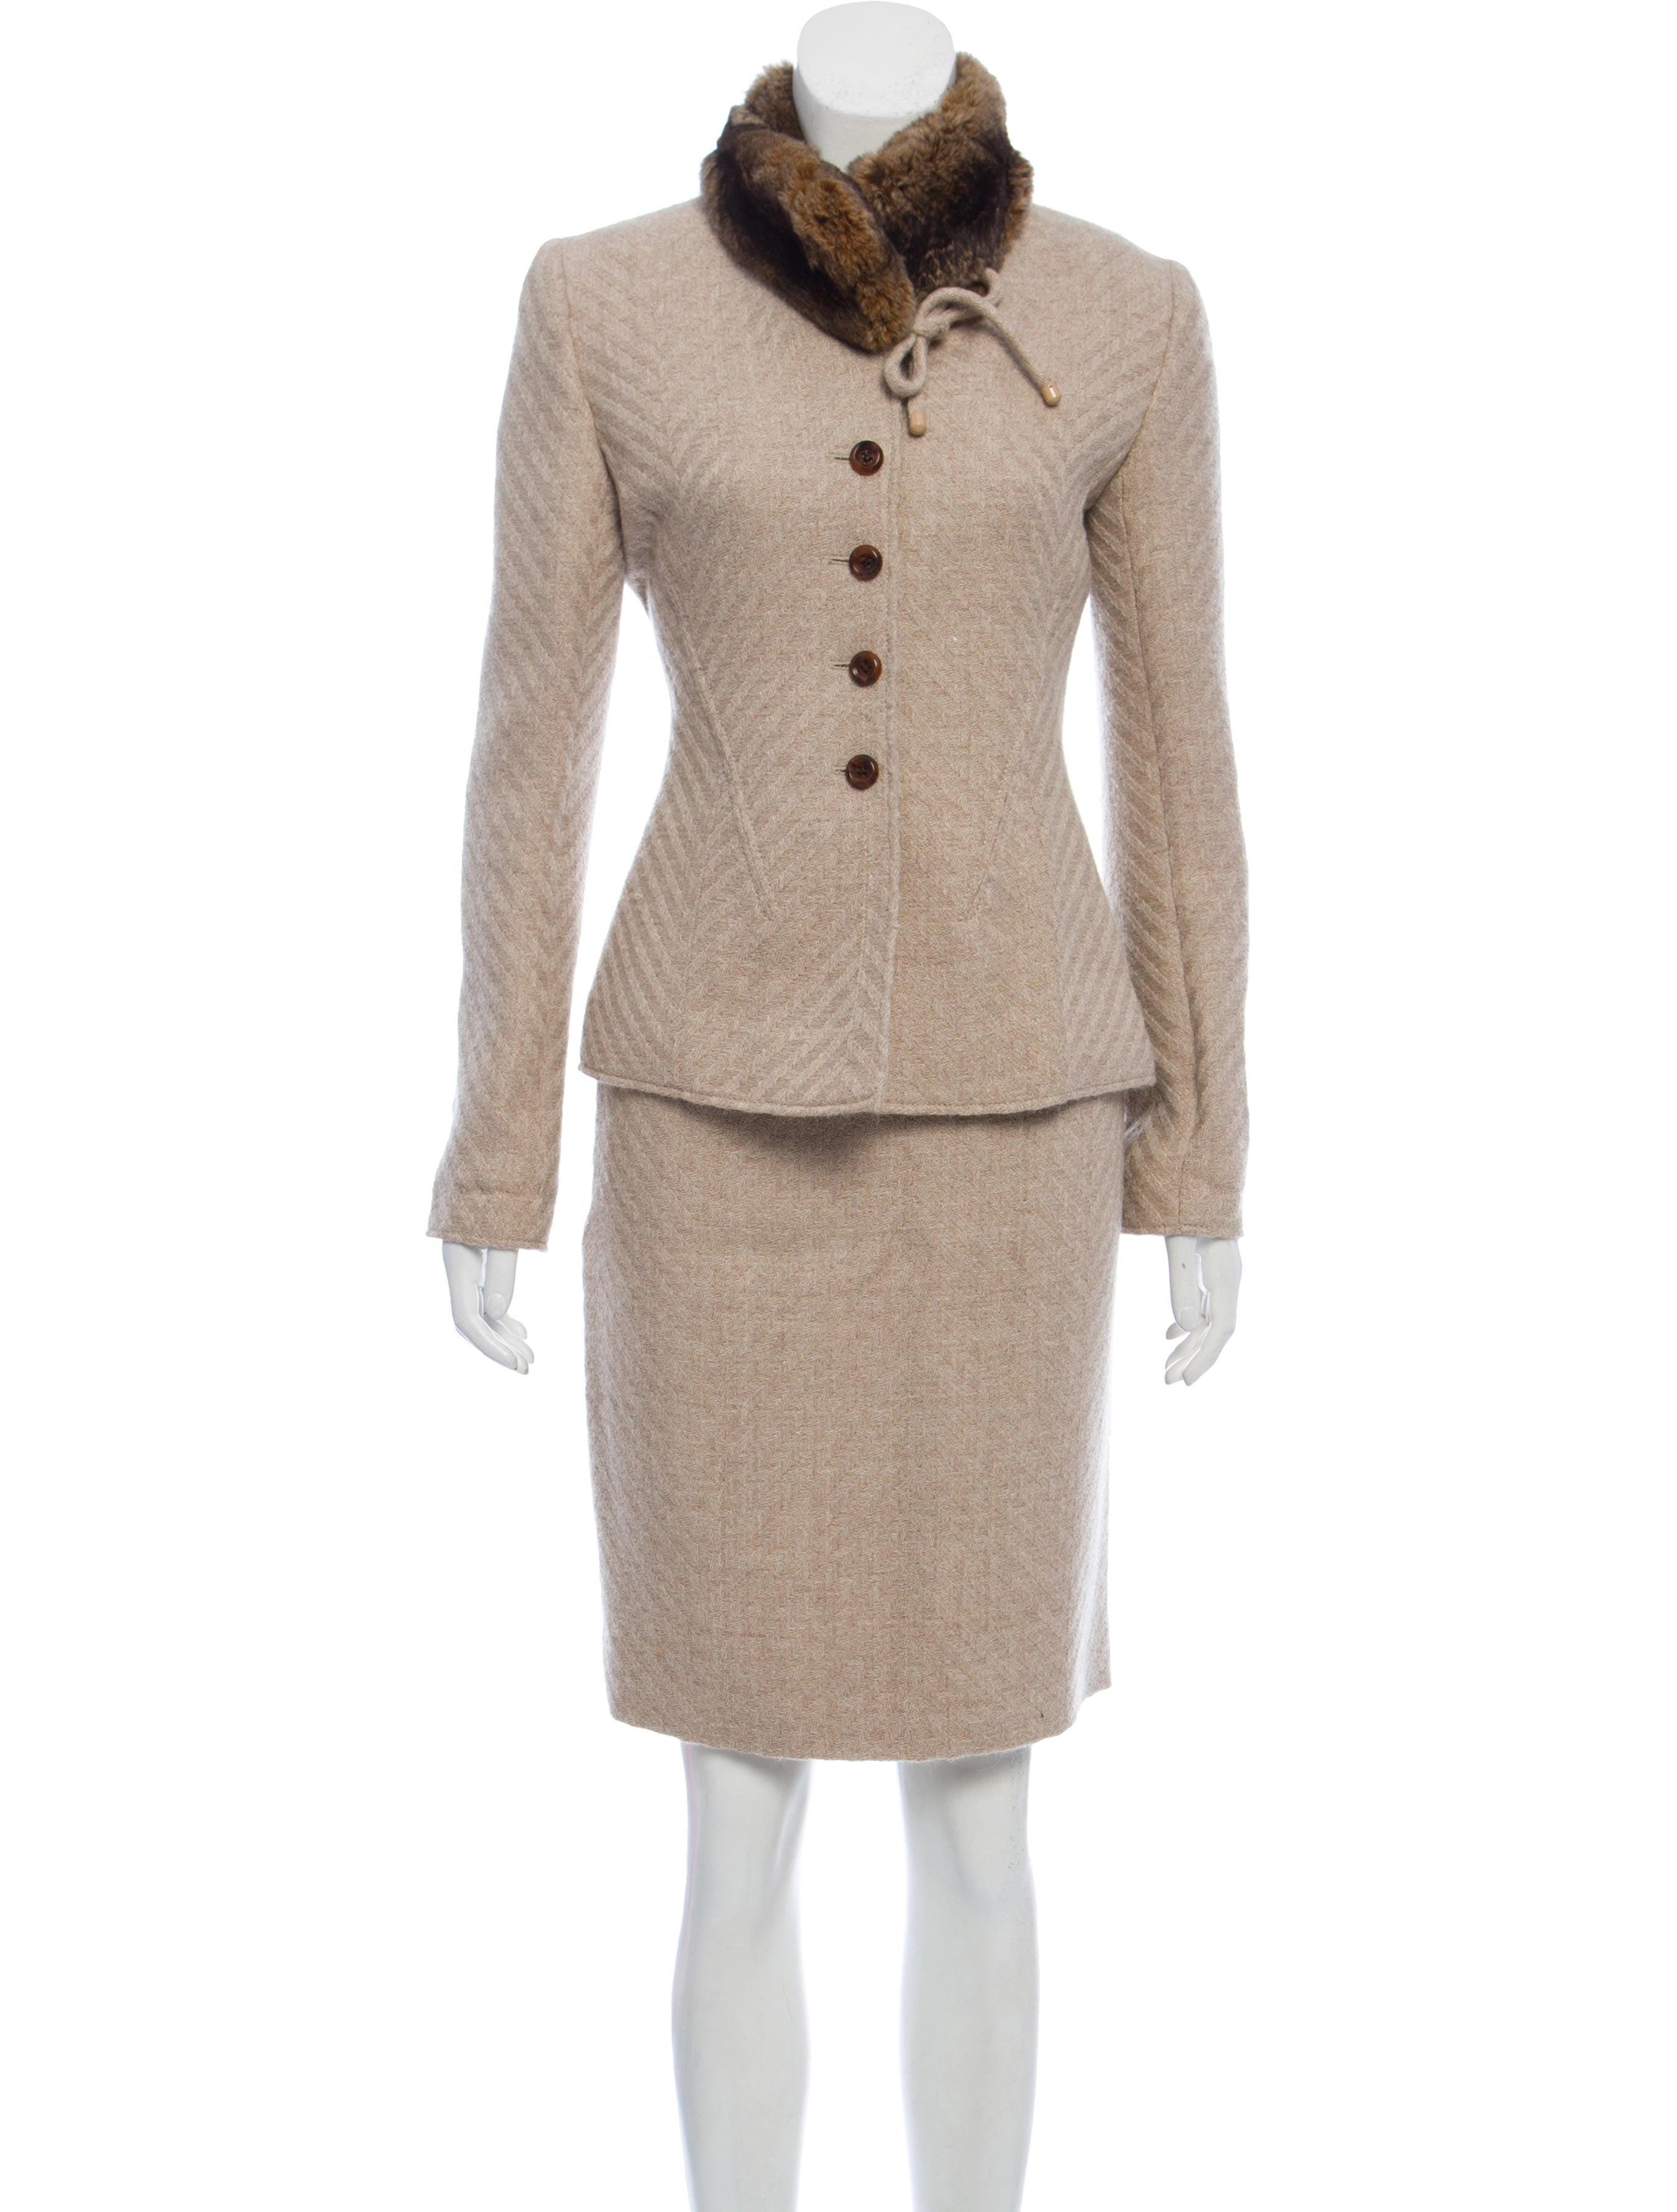 514ea6f1e Valentino Vintage Fur Trim Skirt Suit - Clothing - VAL119877 | The ...